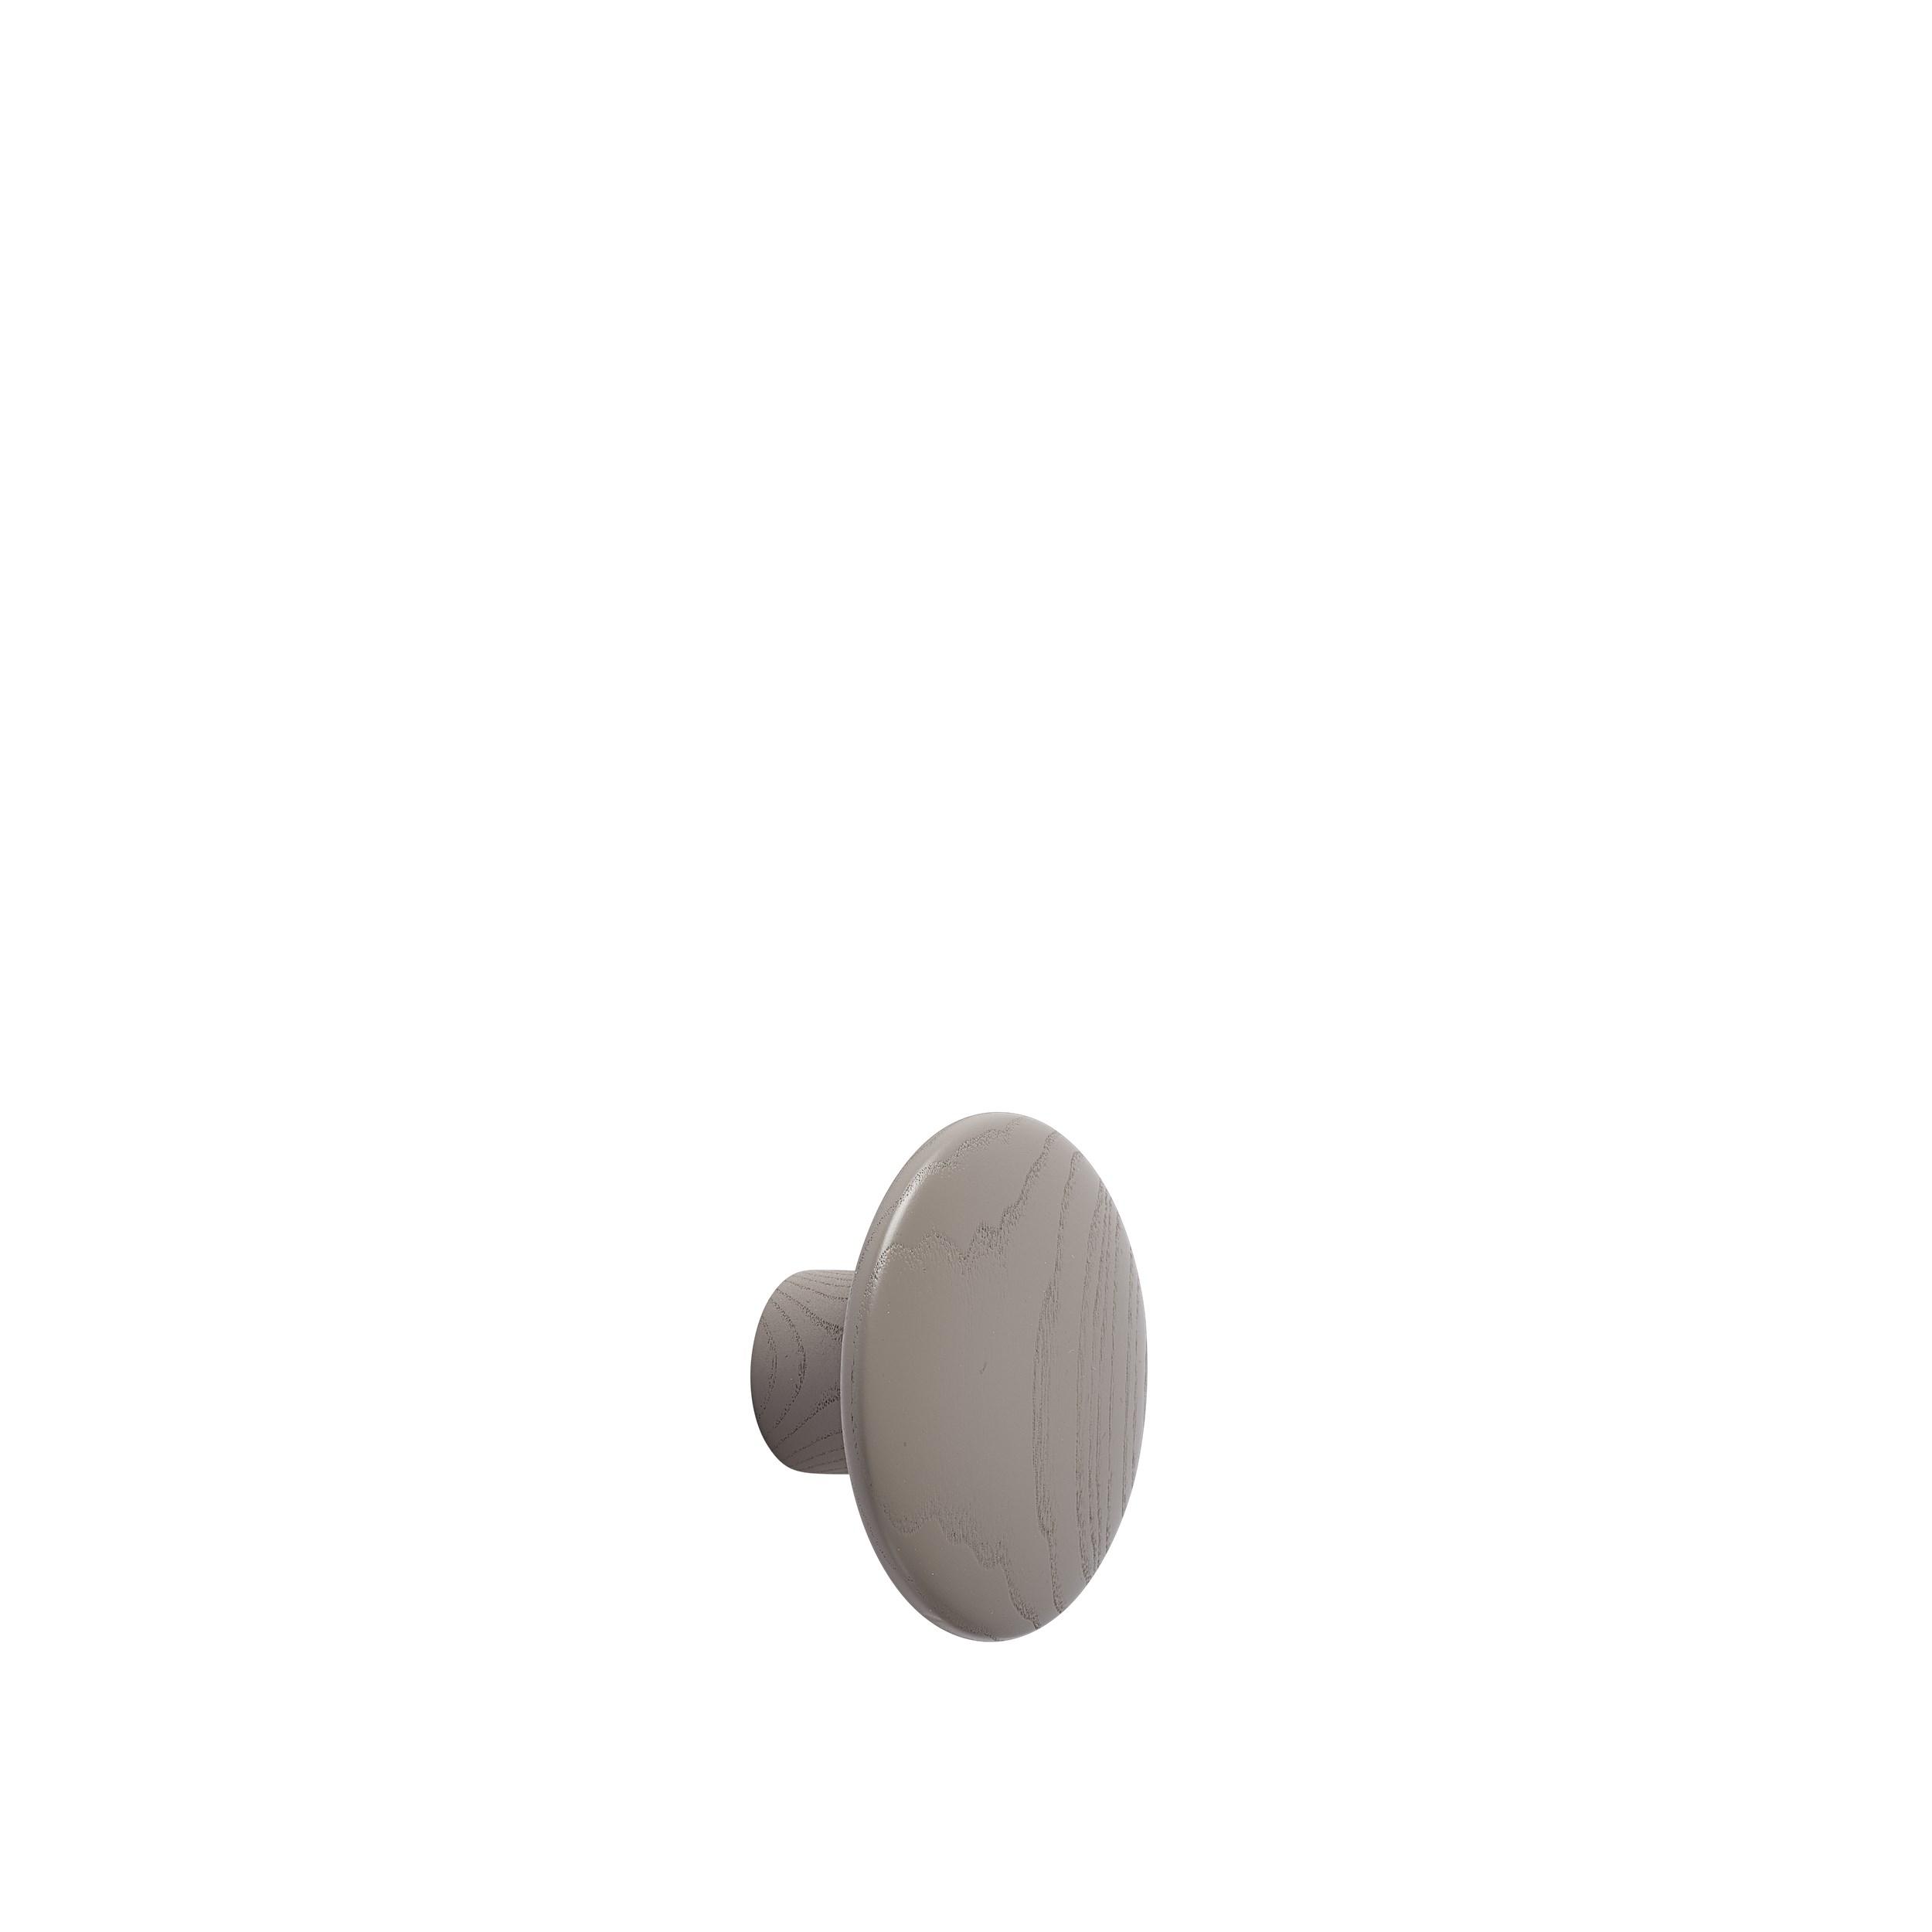 Dot wood small Ø 9 cm taupe